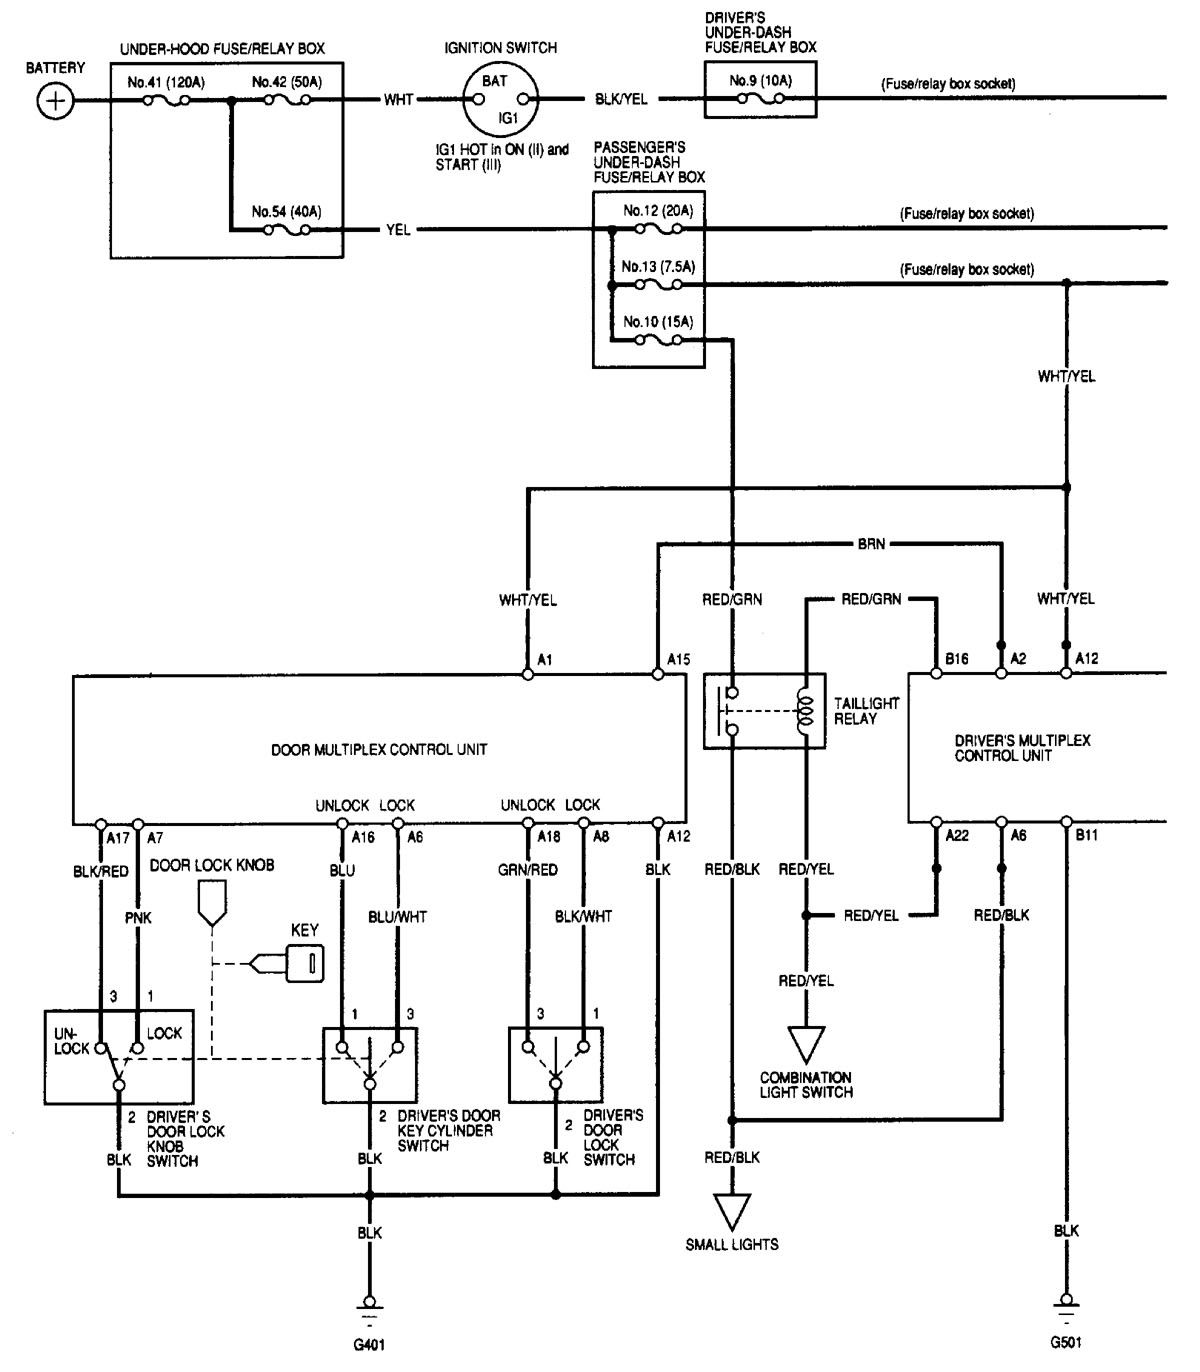 Acura Mdx 2001 Wiring Diagrams Security Anti Theft Carknowledge Hyundai Trajet Diagram Part 1